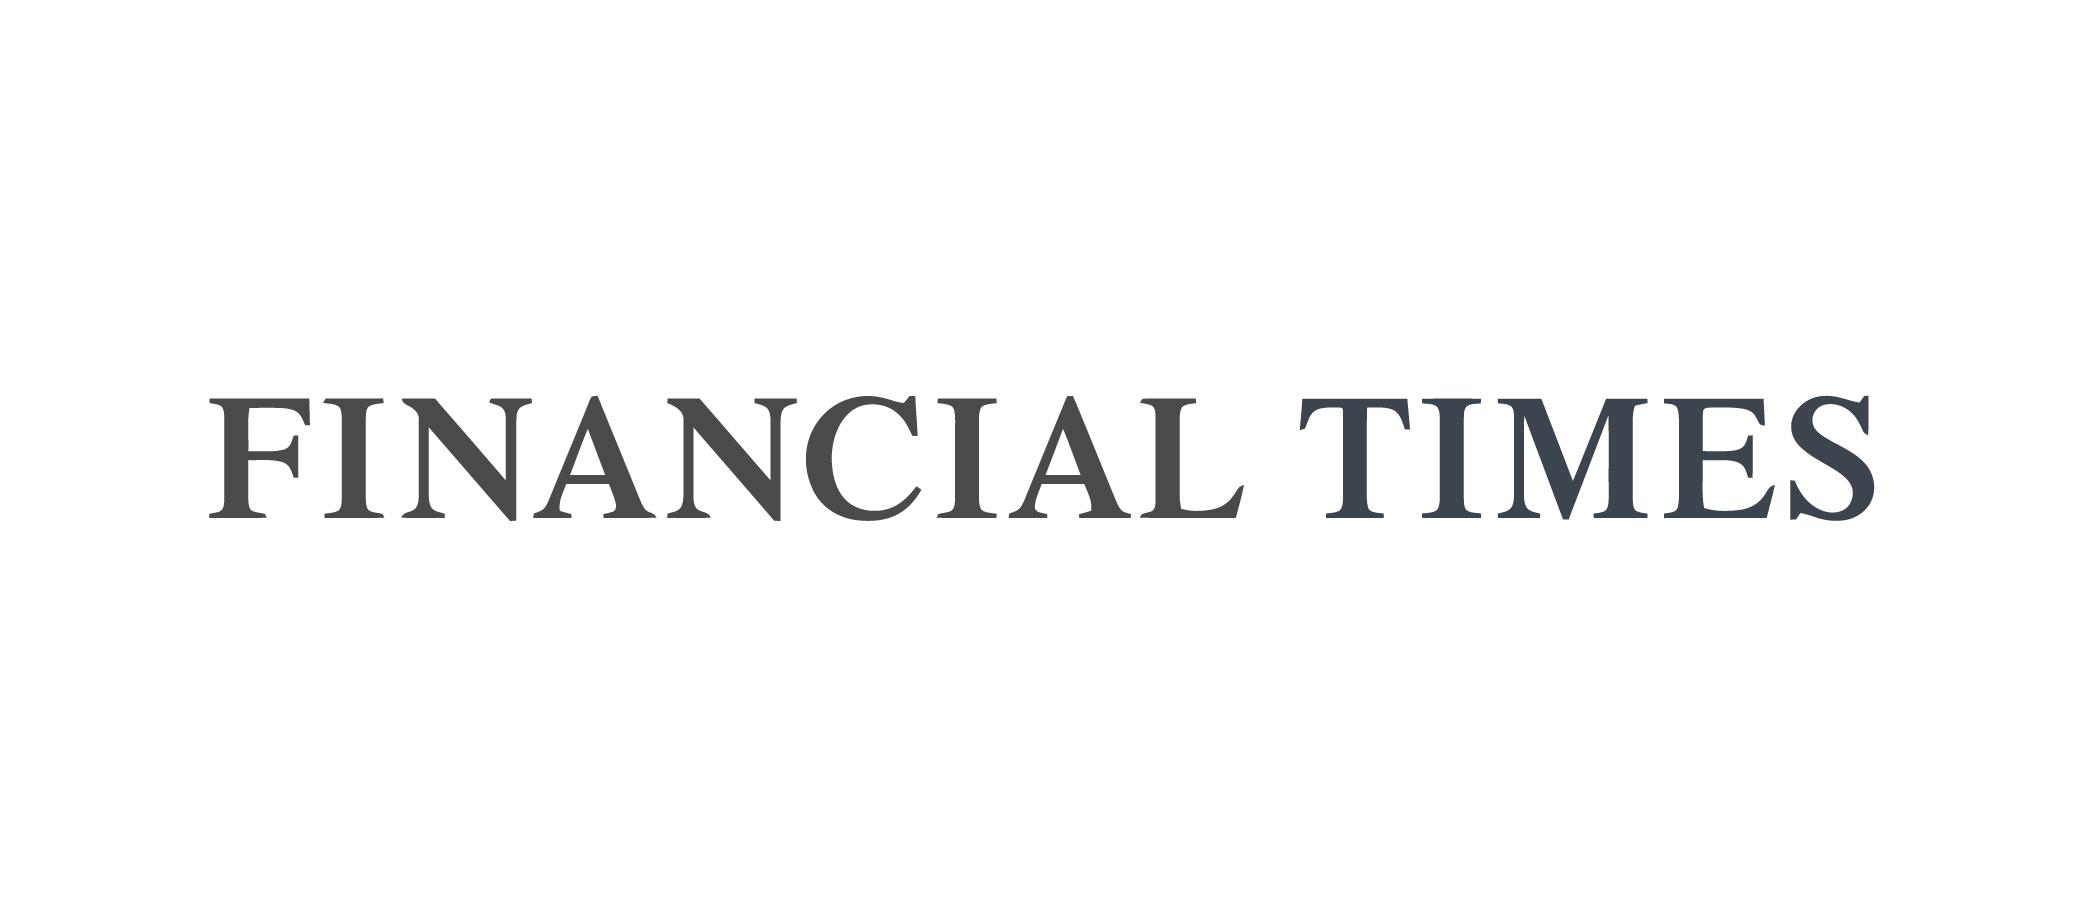 Press Logos - Financial Times - Nannytax